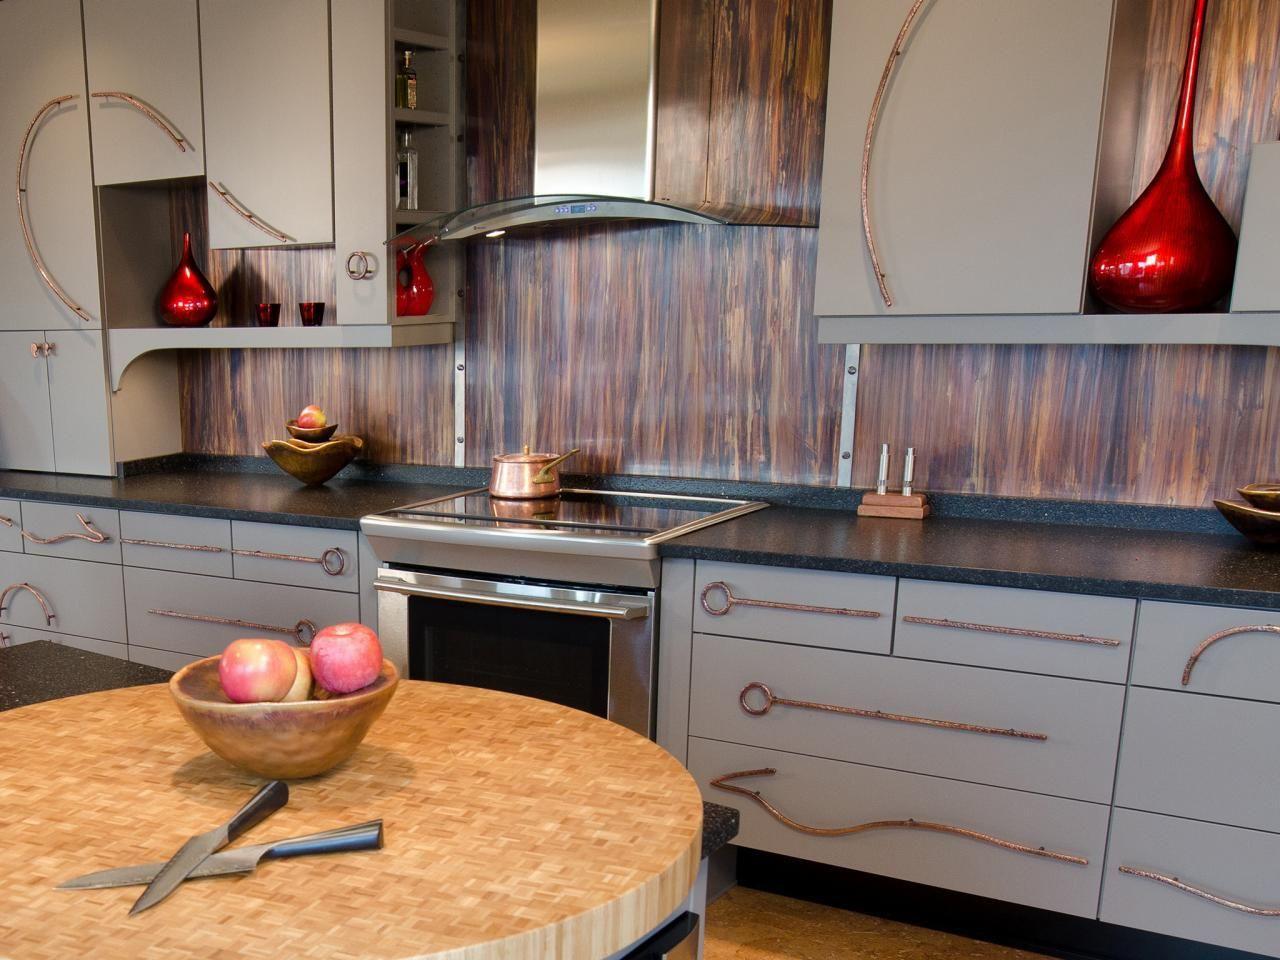 Metal Backsplash Ideas Pictures Tips Hgtv Kitchen Ideas Kitchen Backsplash Ideas Decorative Tin Tiles Metal Backsplash